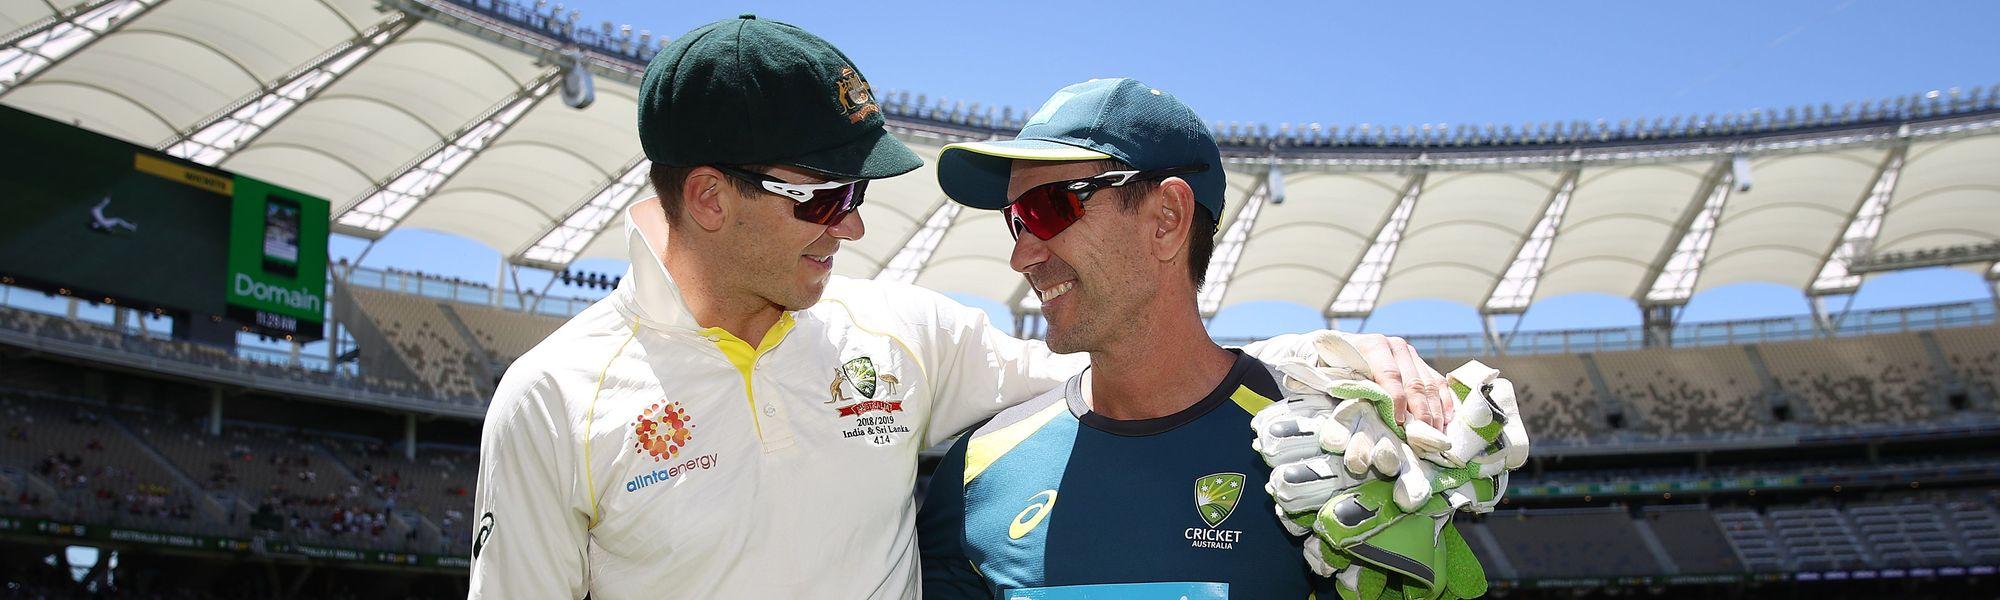 His leadership has been brilliant' – Justin Langer backs Tim Paine as  Australia's long-term Test captain